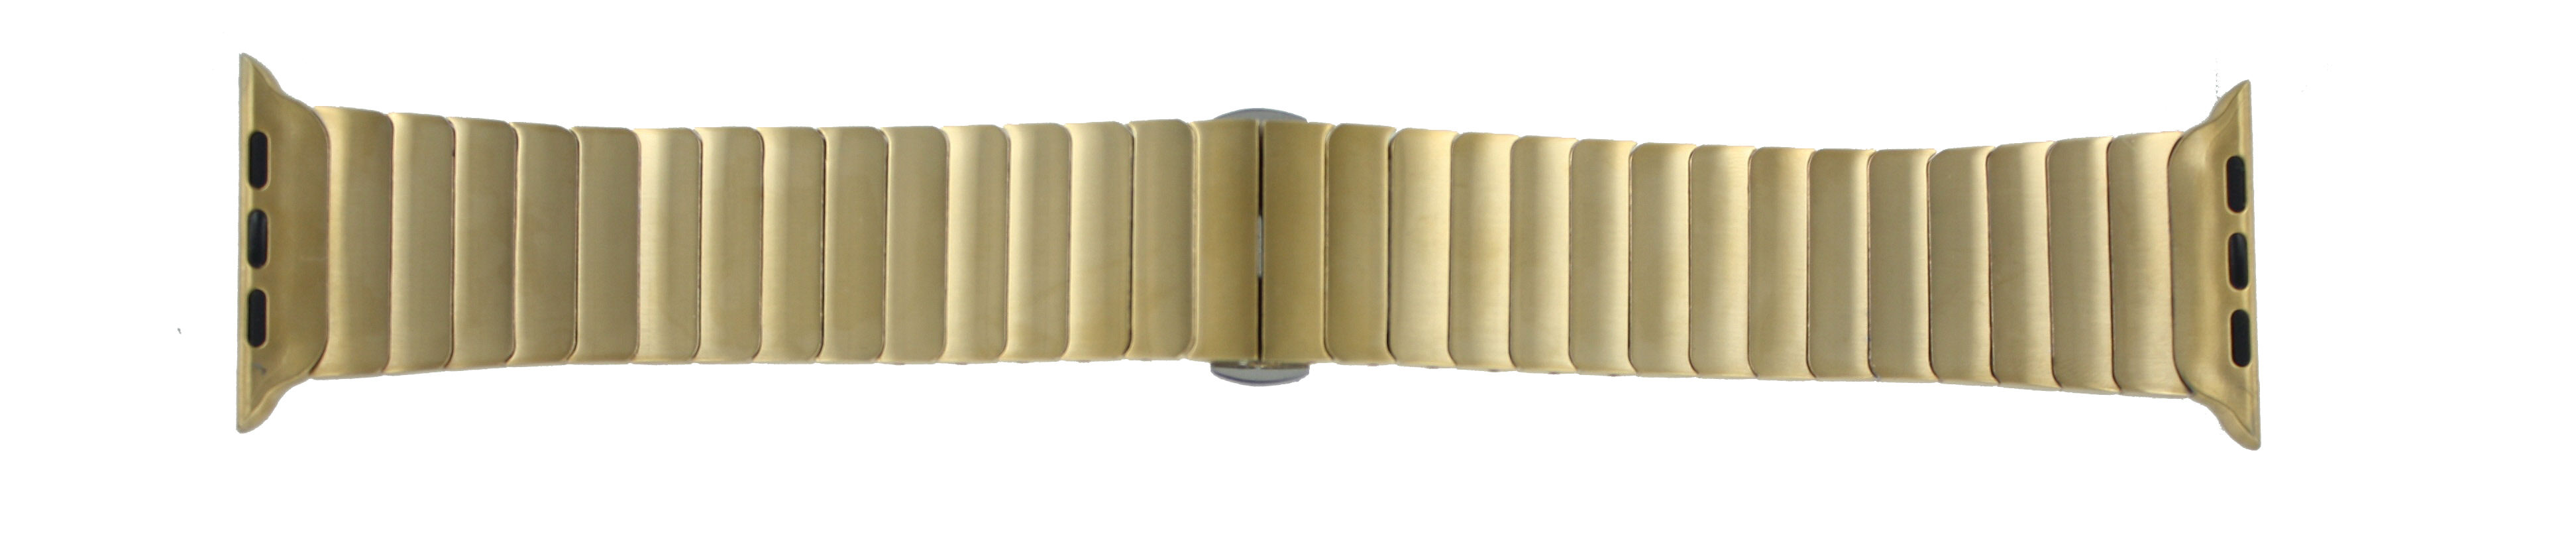 Apple (replacement model) klockarmband LS-AB-107 Stål Guld (Doublé) 42mm